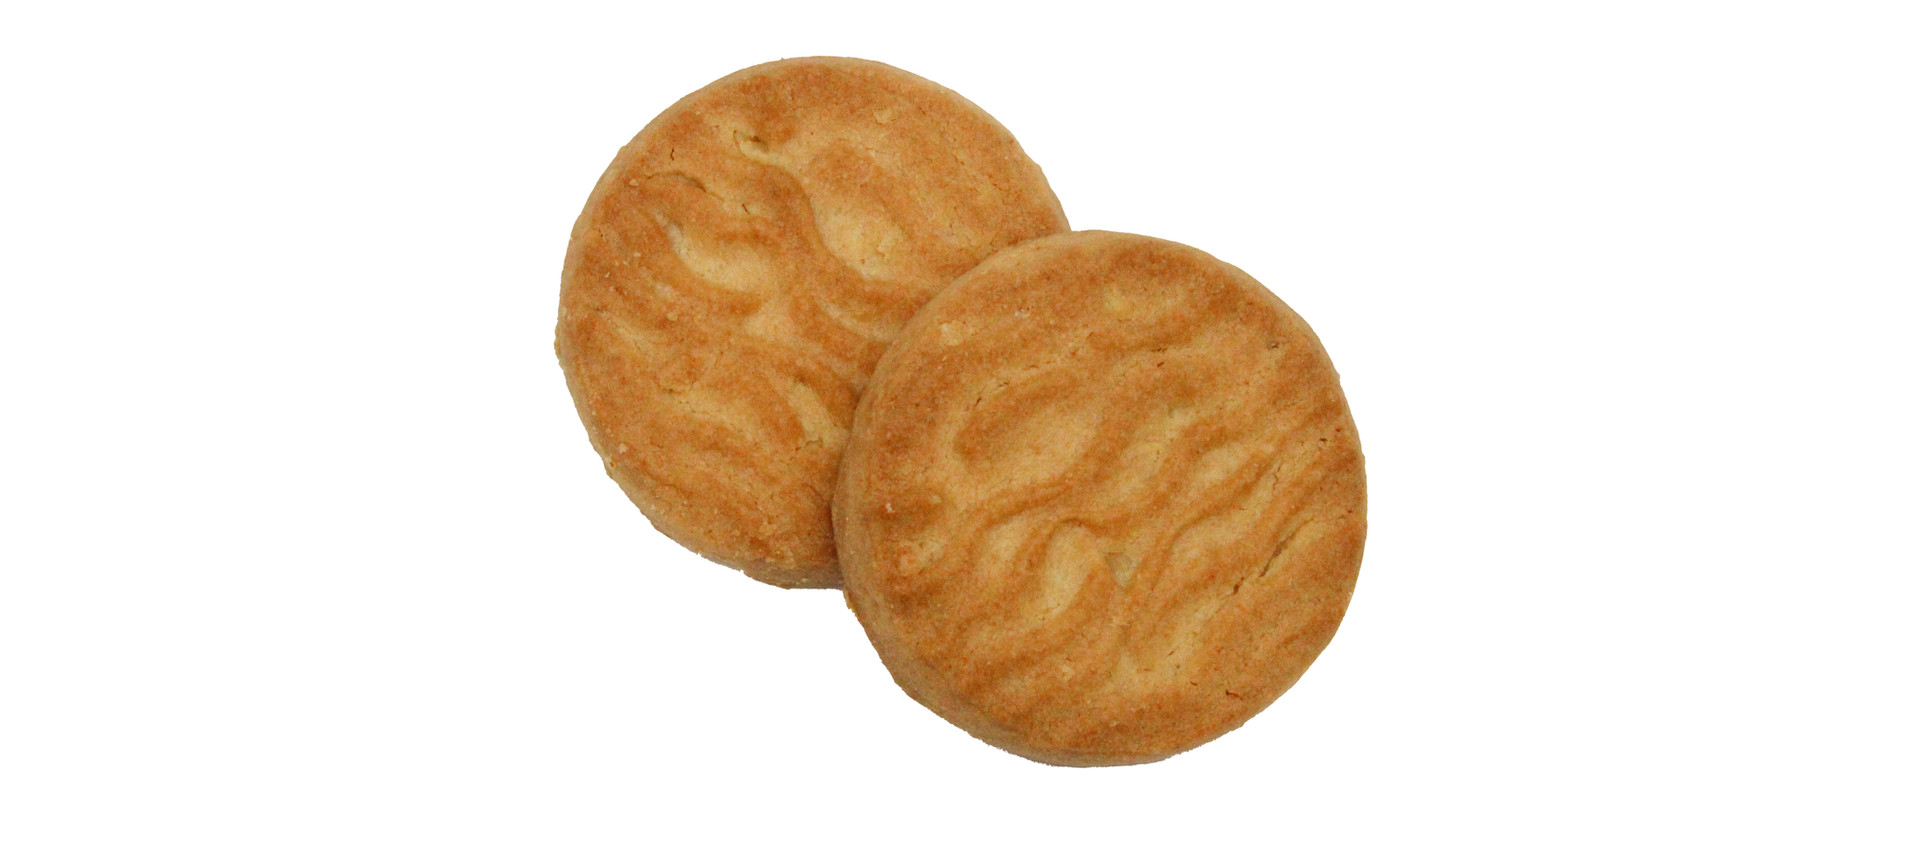 Twin Oatmeal Product